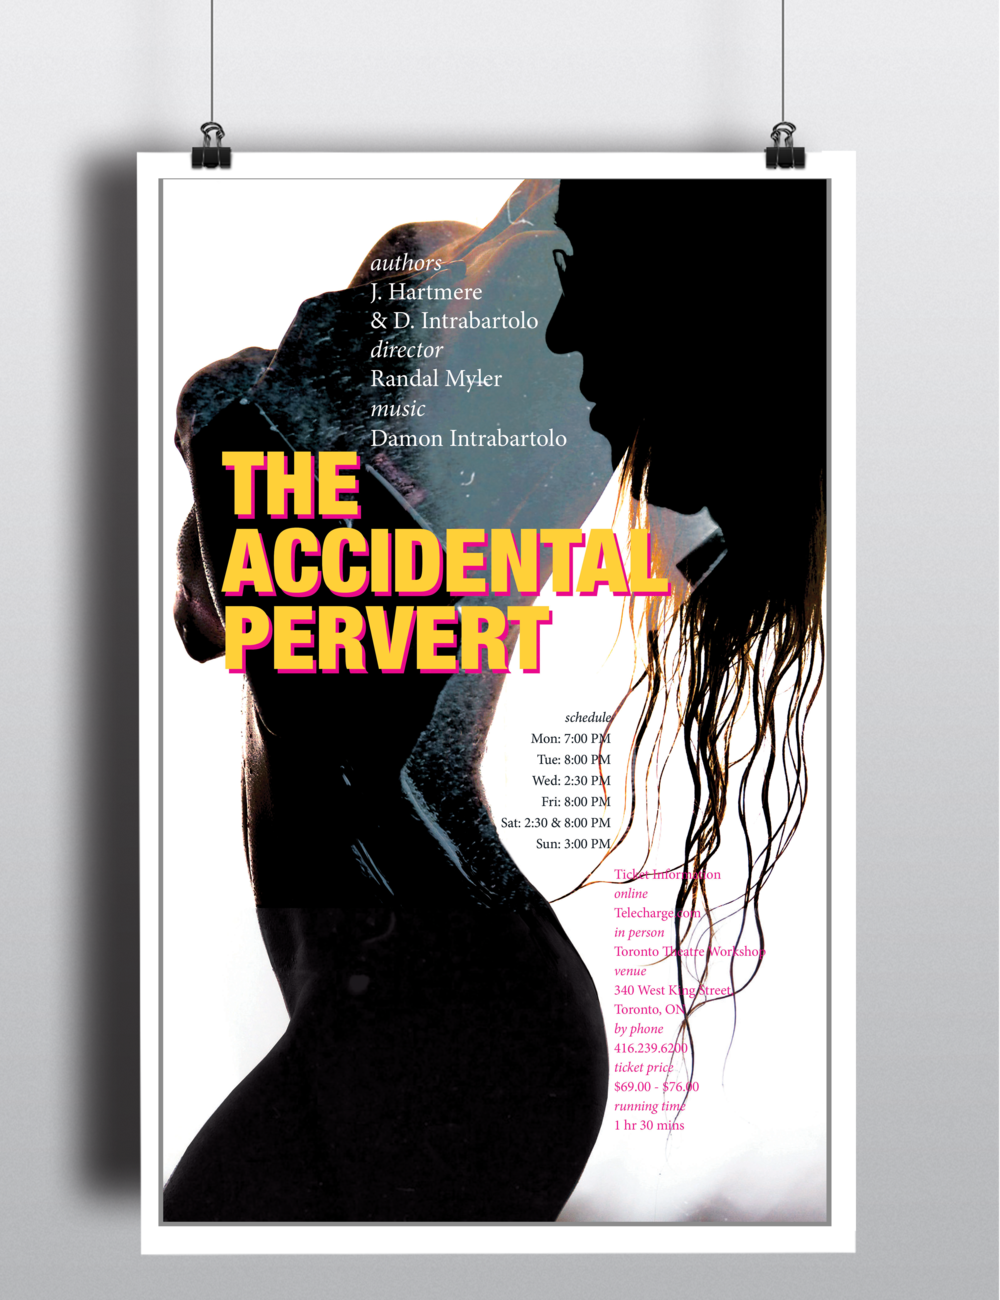 The Accidental Pervert